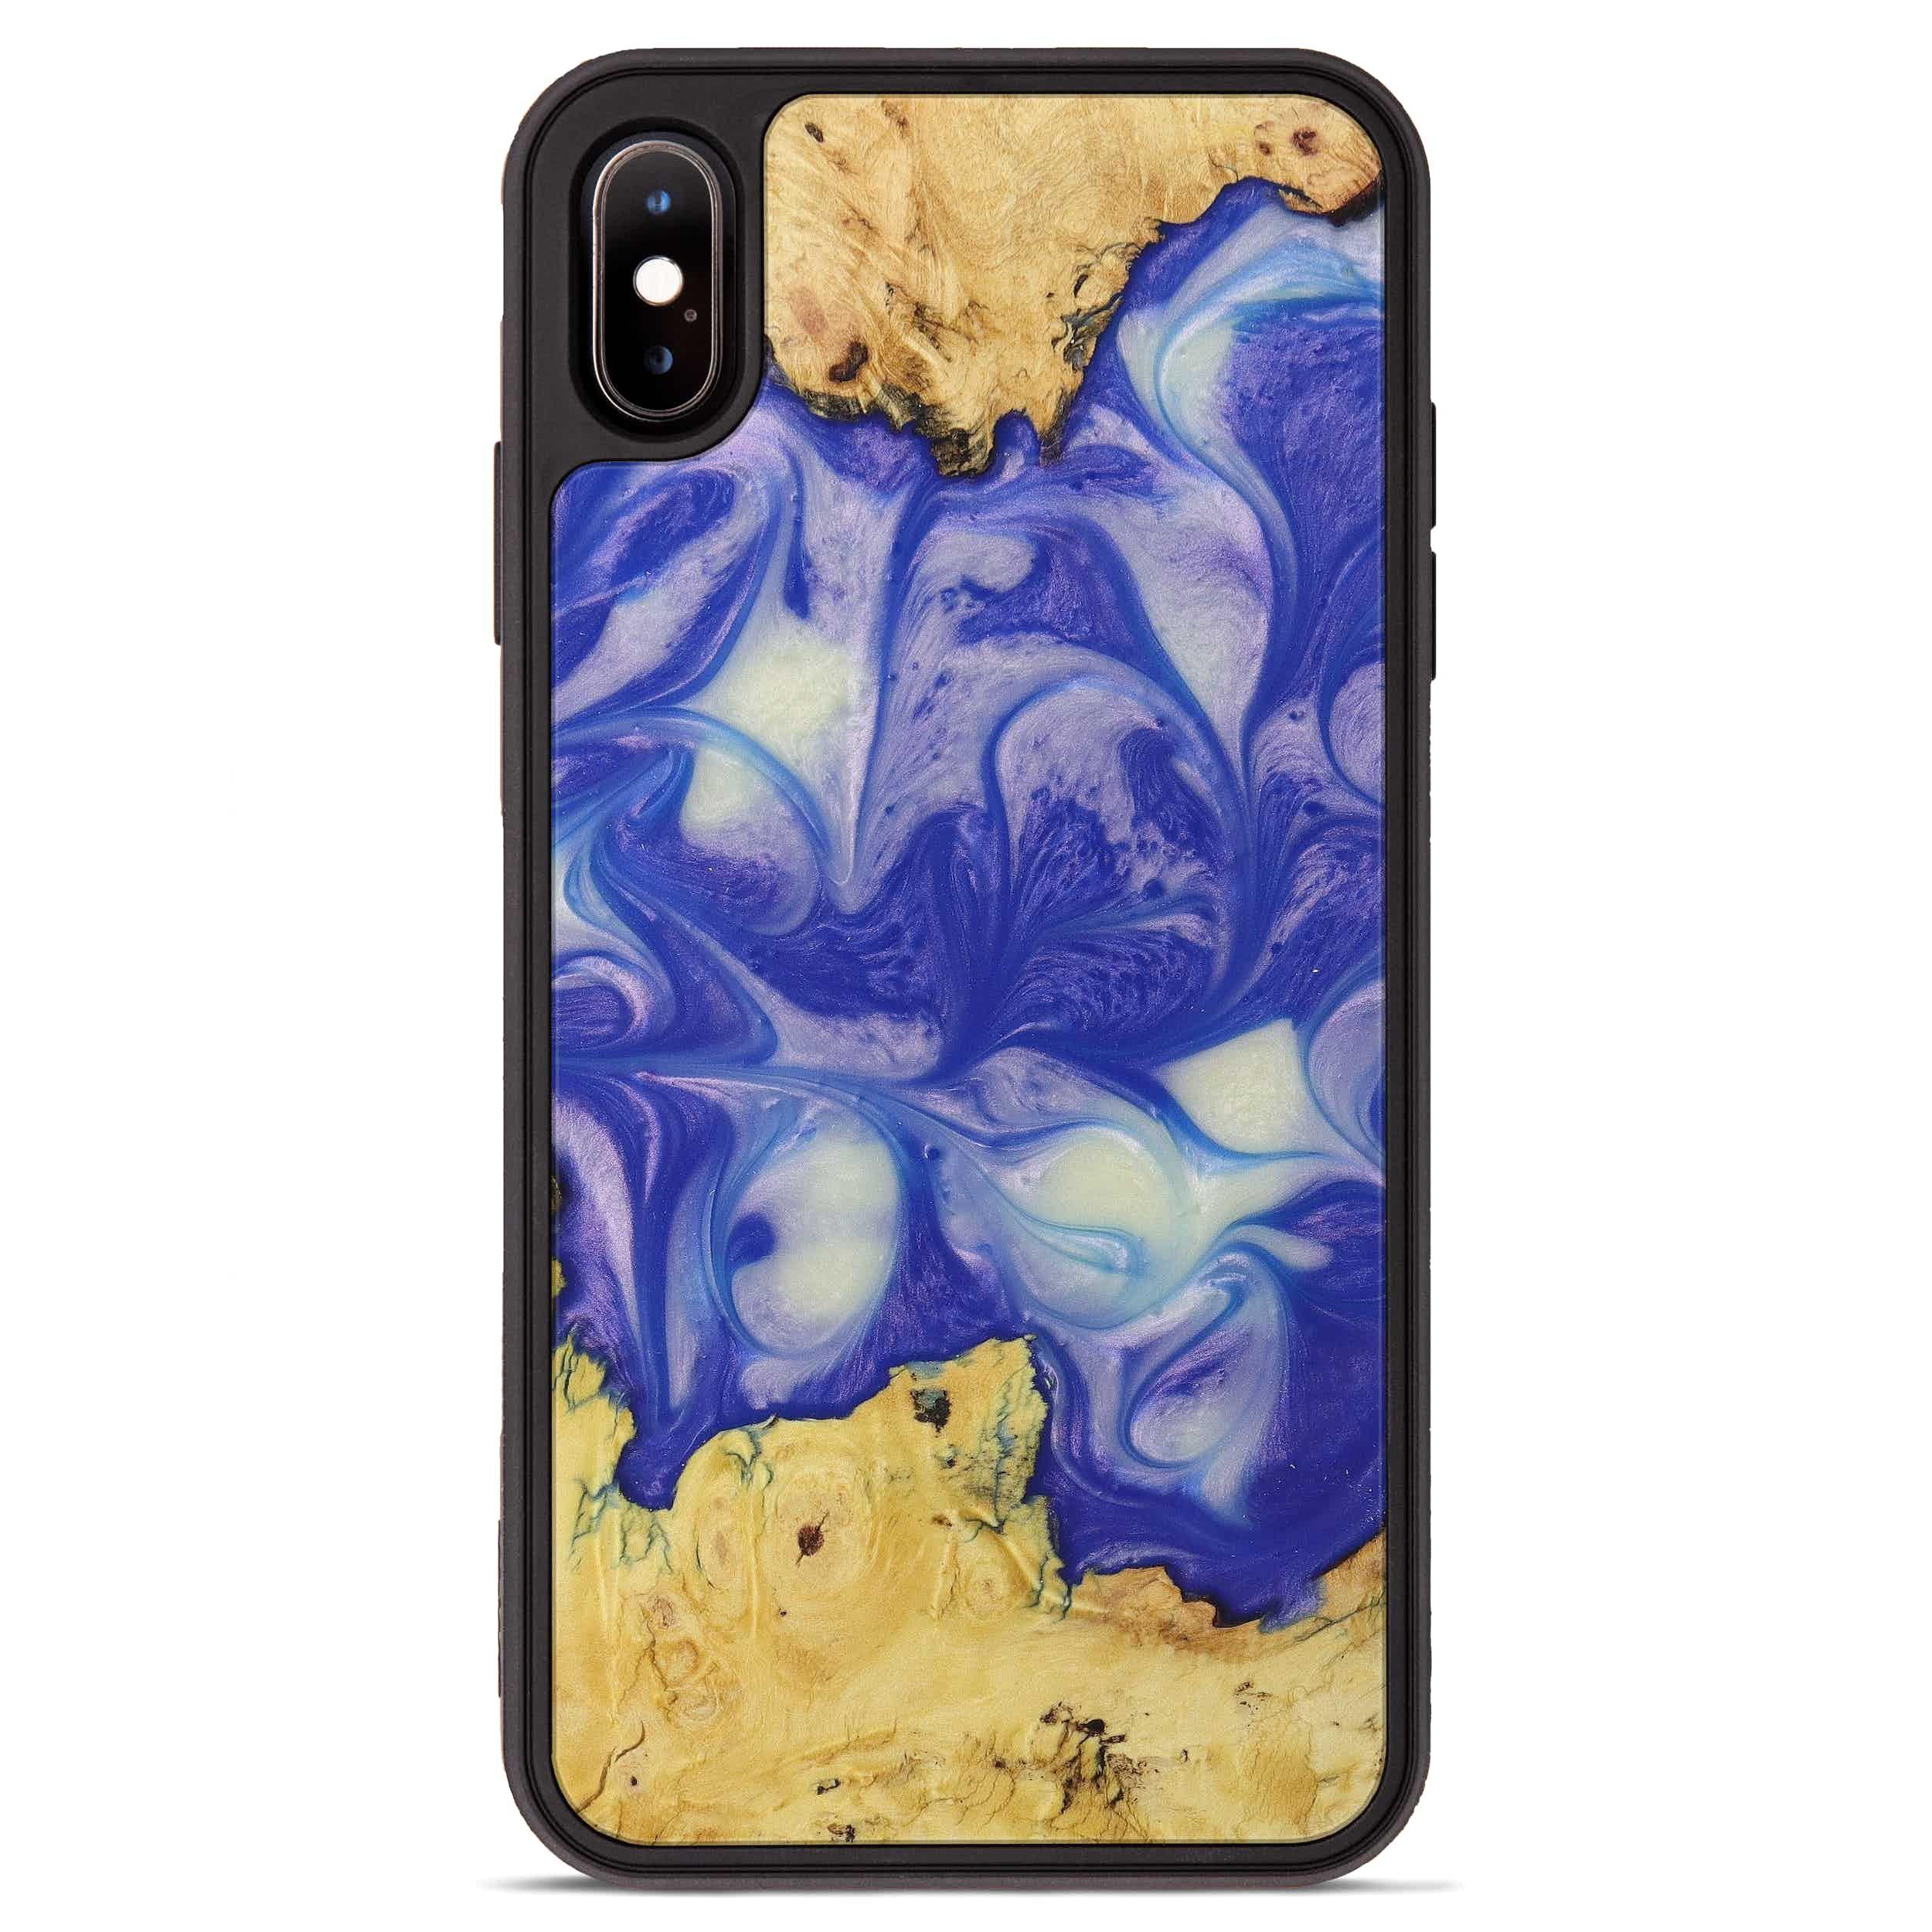 iPhone Xs Max Wood+Resin Phone Case - Subhash (Purple, 395907)